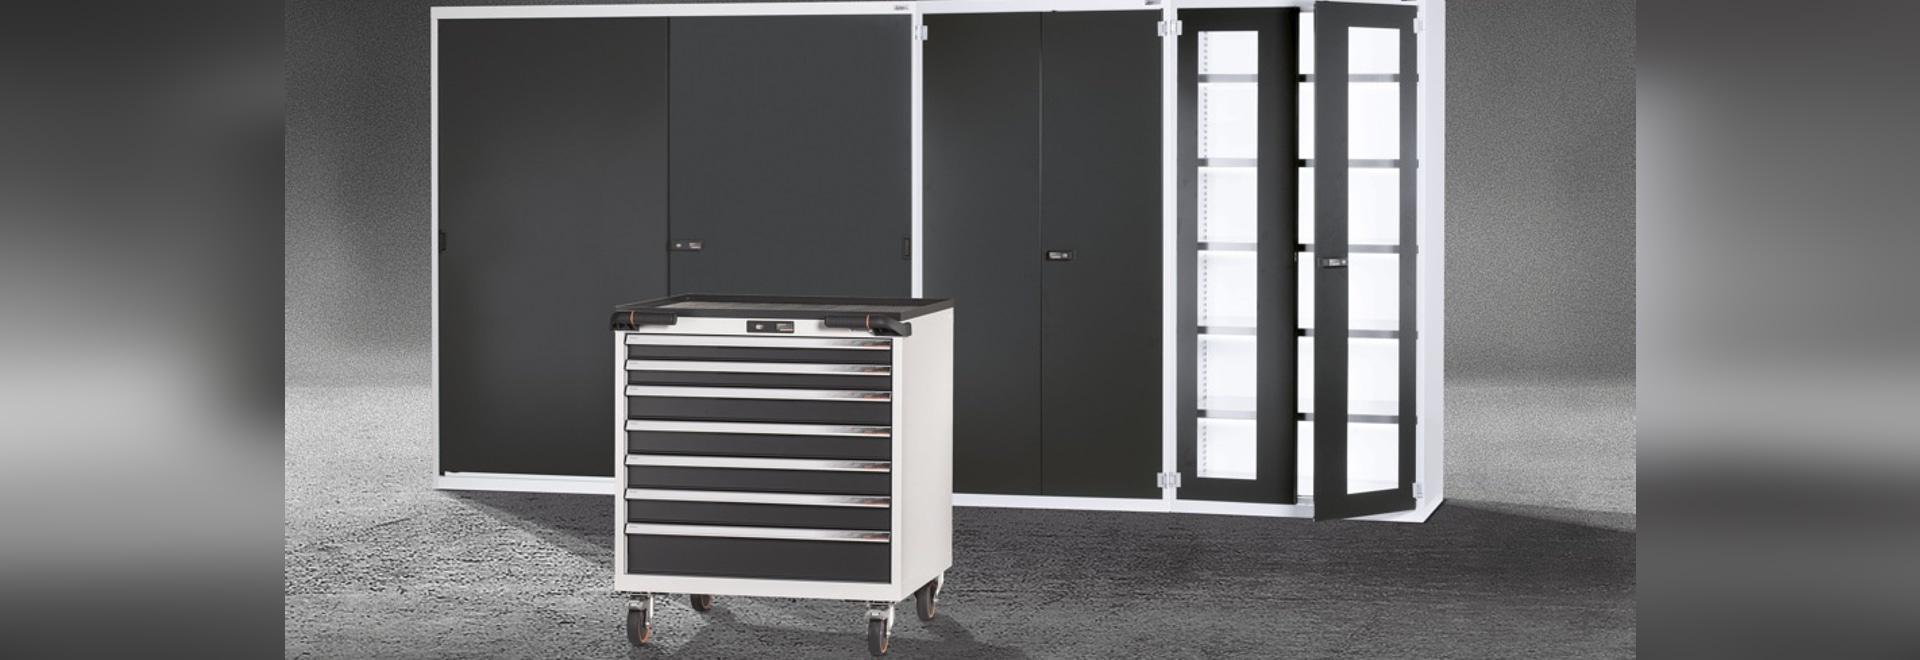 Hoffmann Reveals New Garant Gridline Workshop Cabinets 1